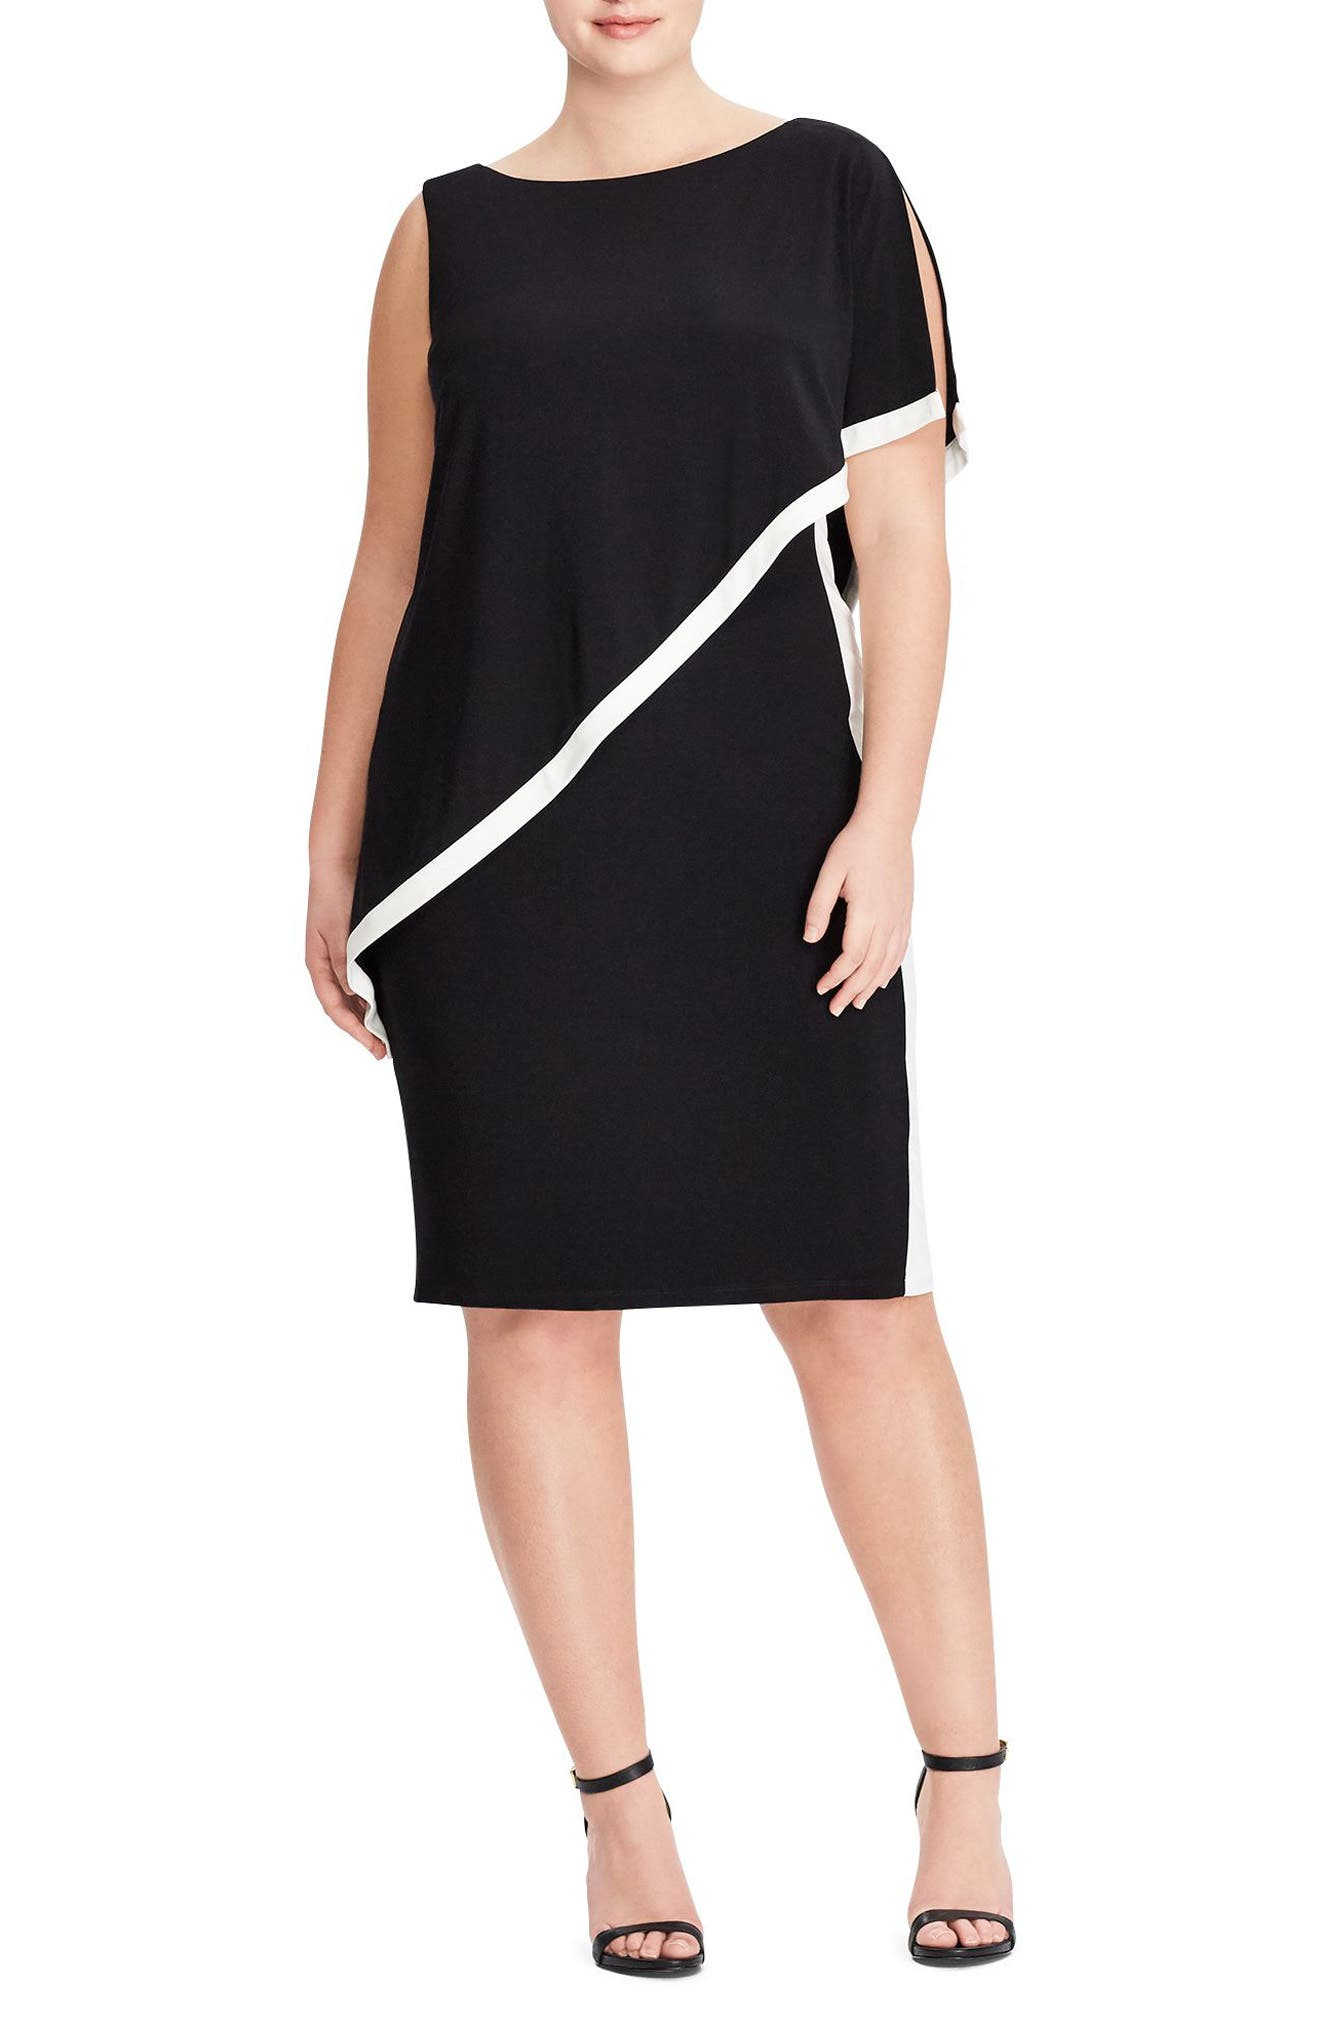 Cape Overlay Sheath Dress,                             Main thumbnail 1, color,                             001